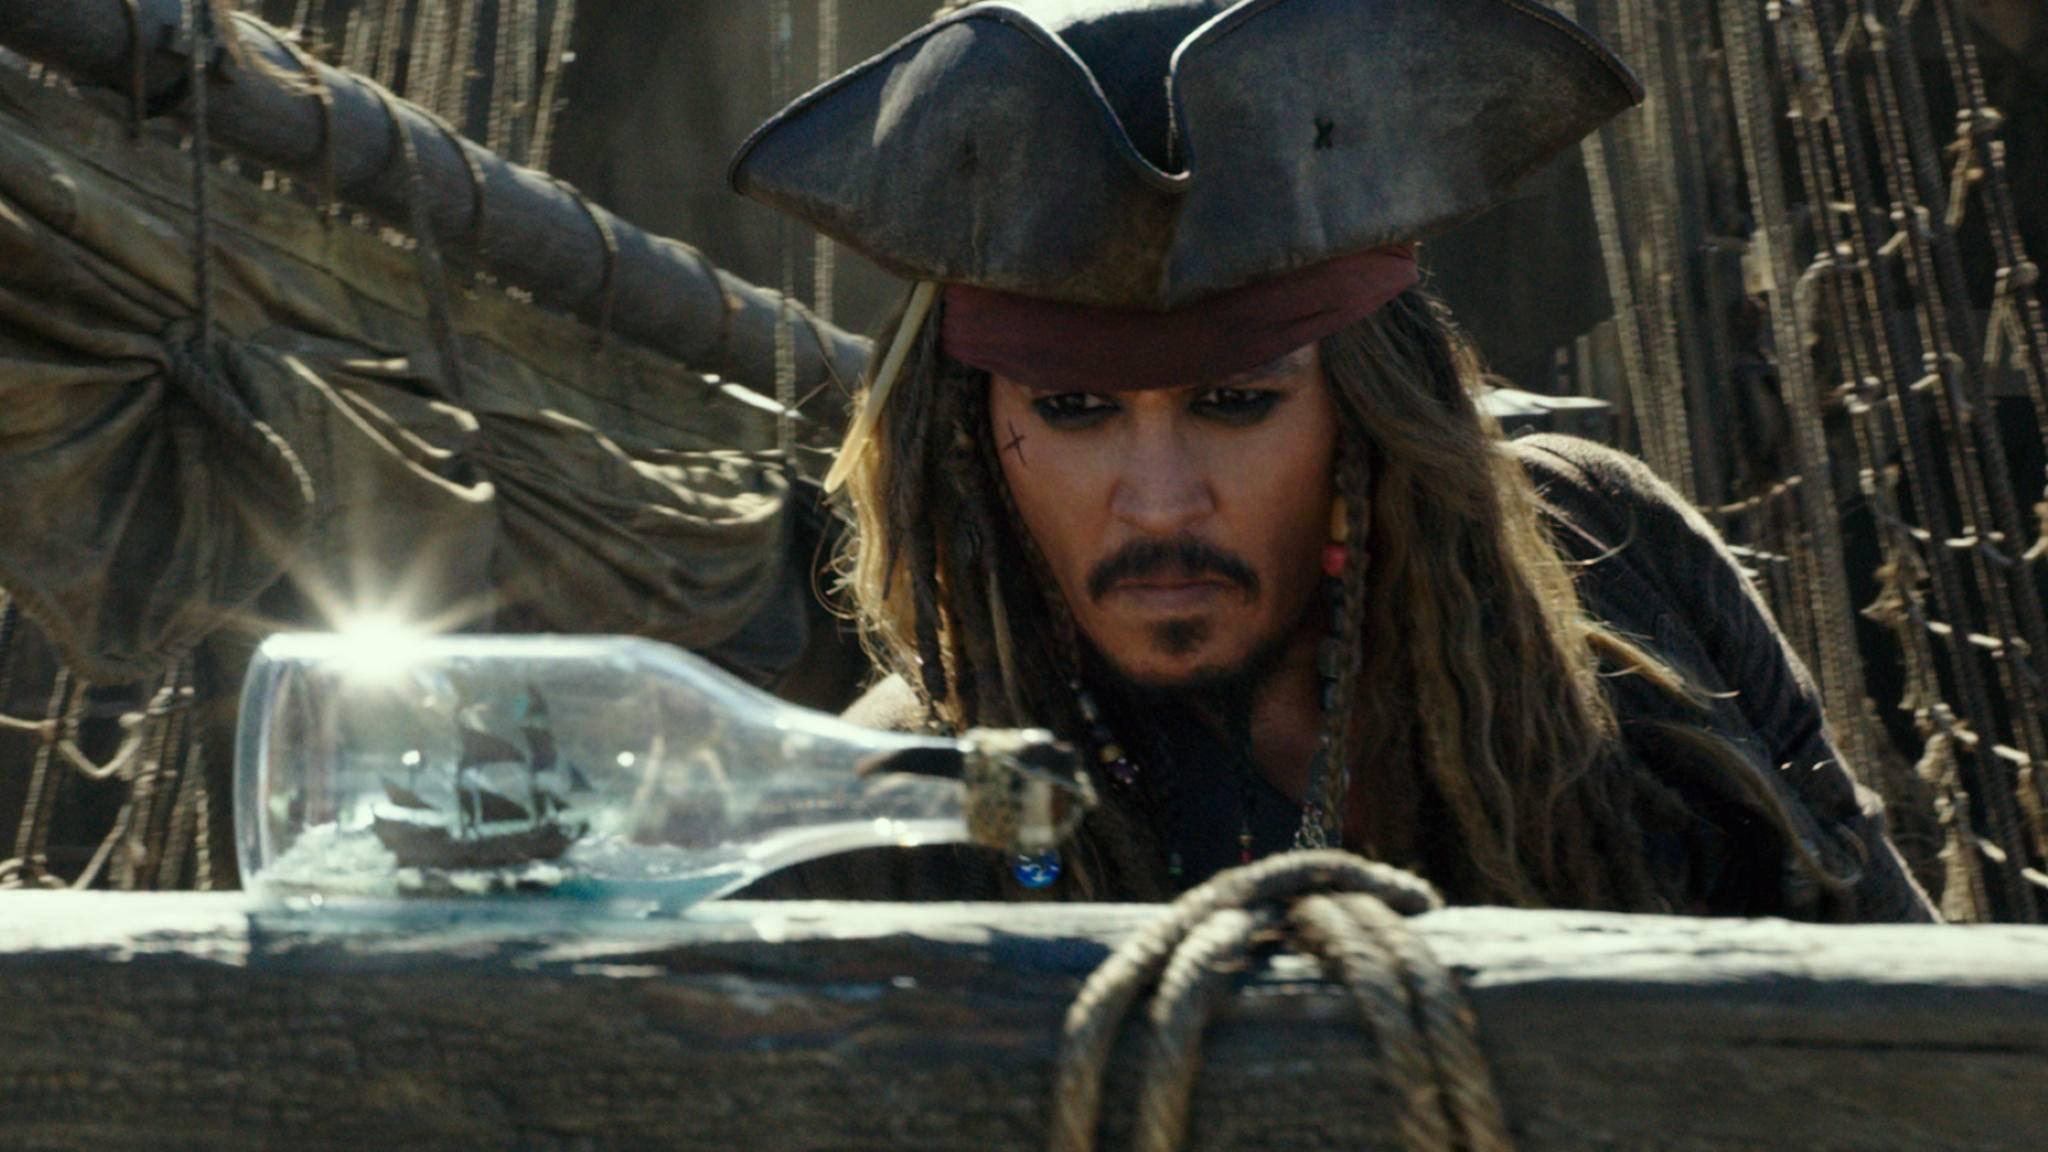 Dandy-Pirat aus Leidenschaft: Captain Jack Sparr(rrr!)ow (Johnny Depp).